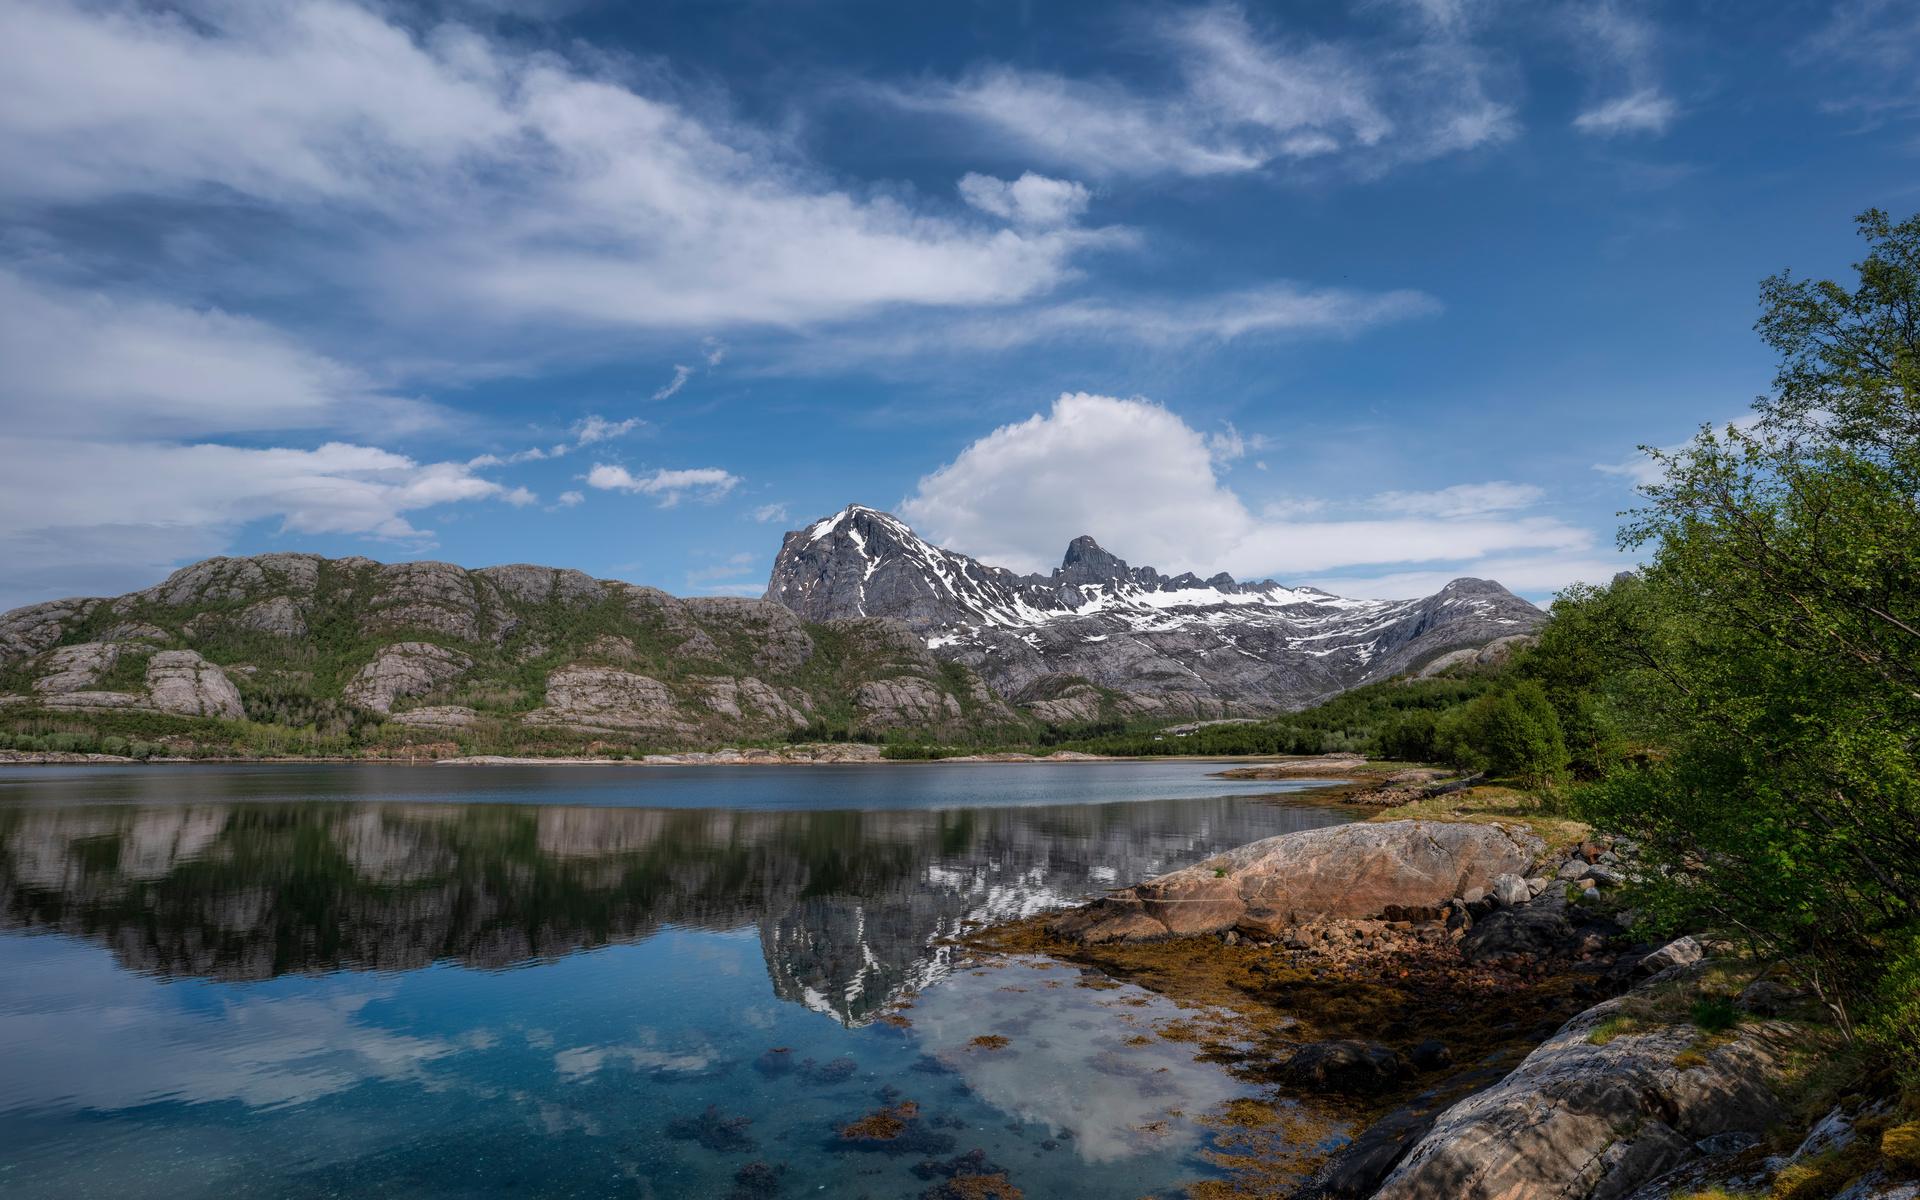 норвегия, горы, небо, jektvik, скала, облака, природа